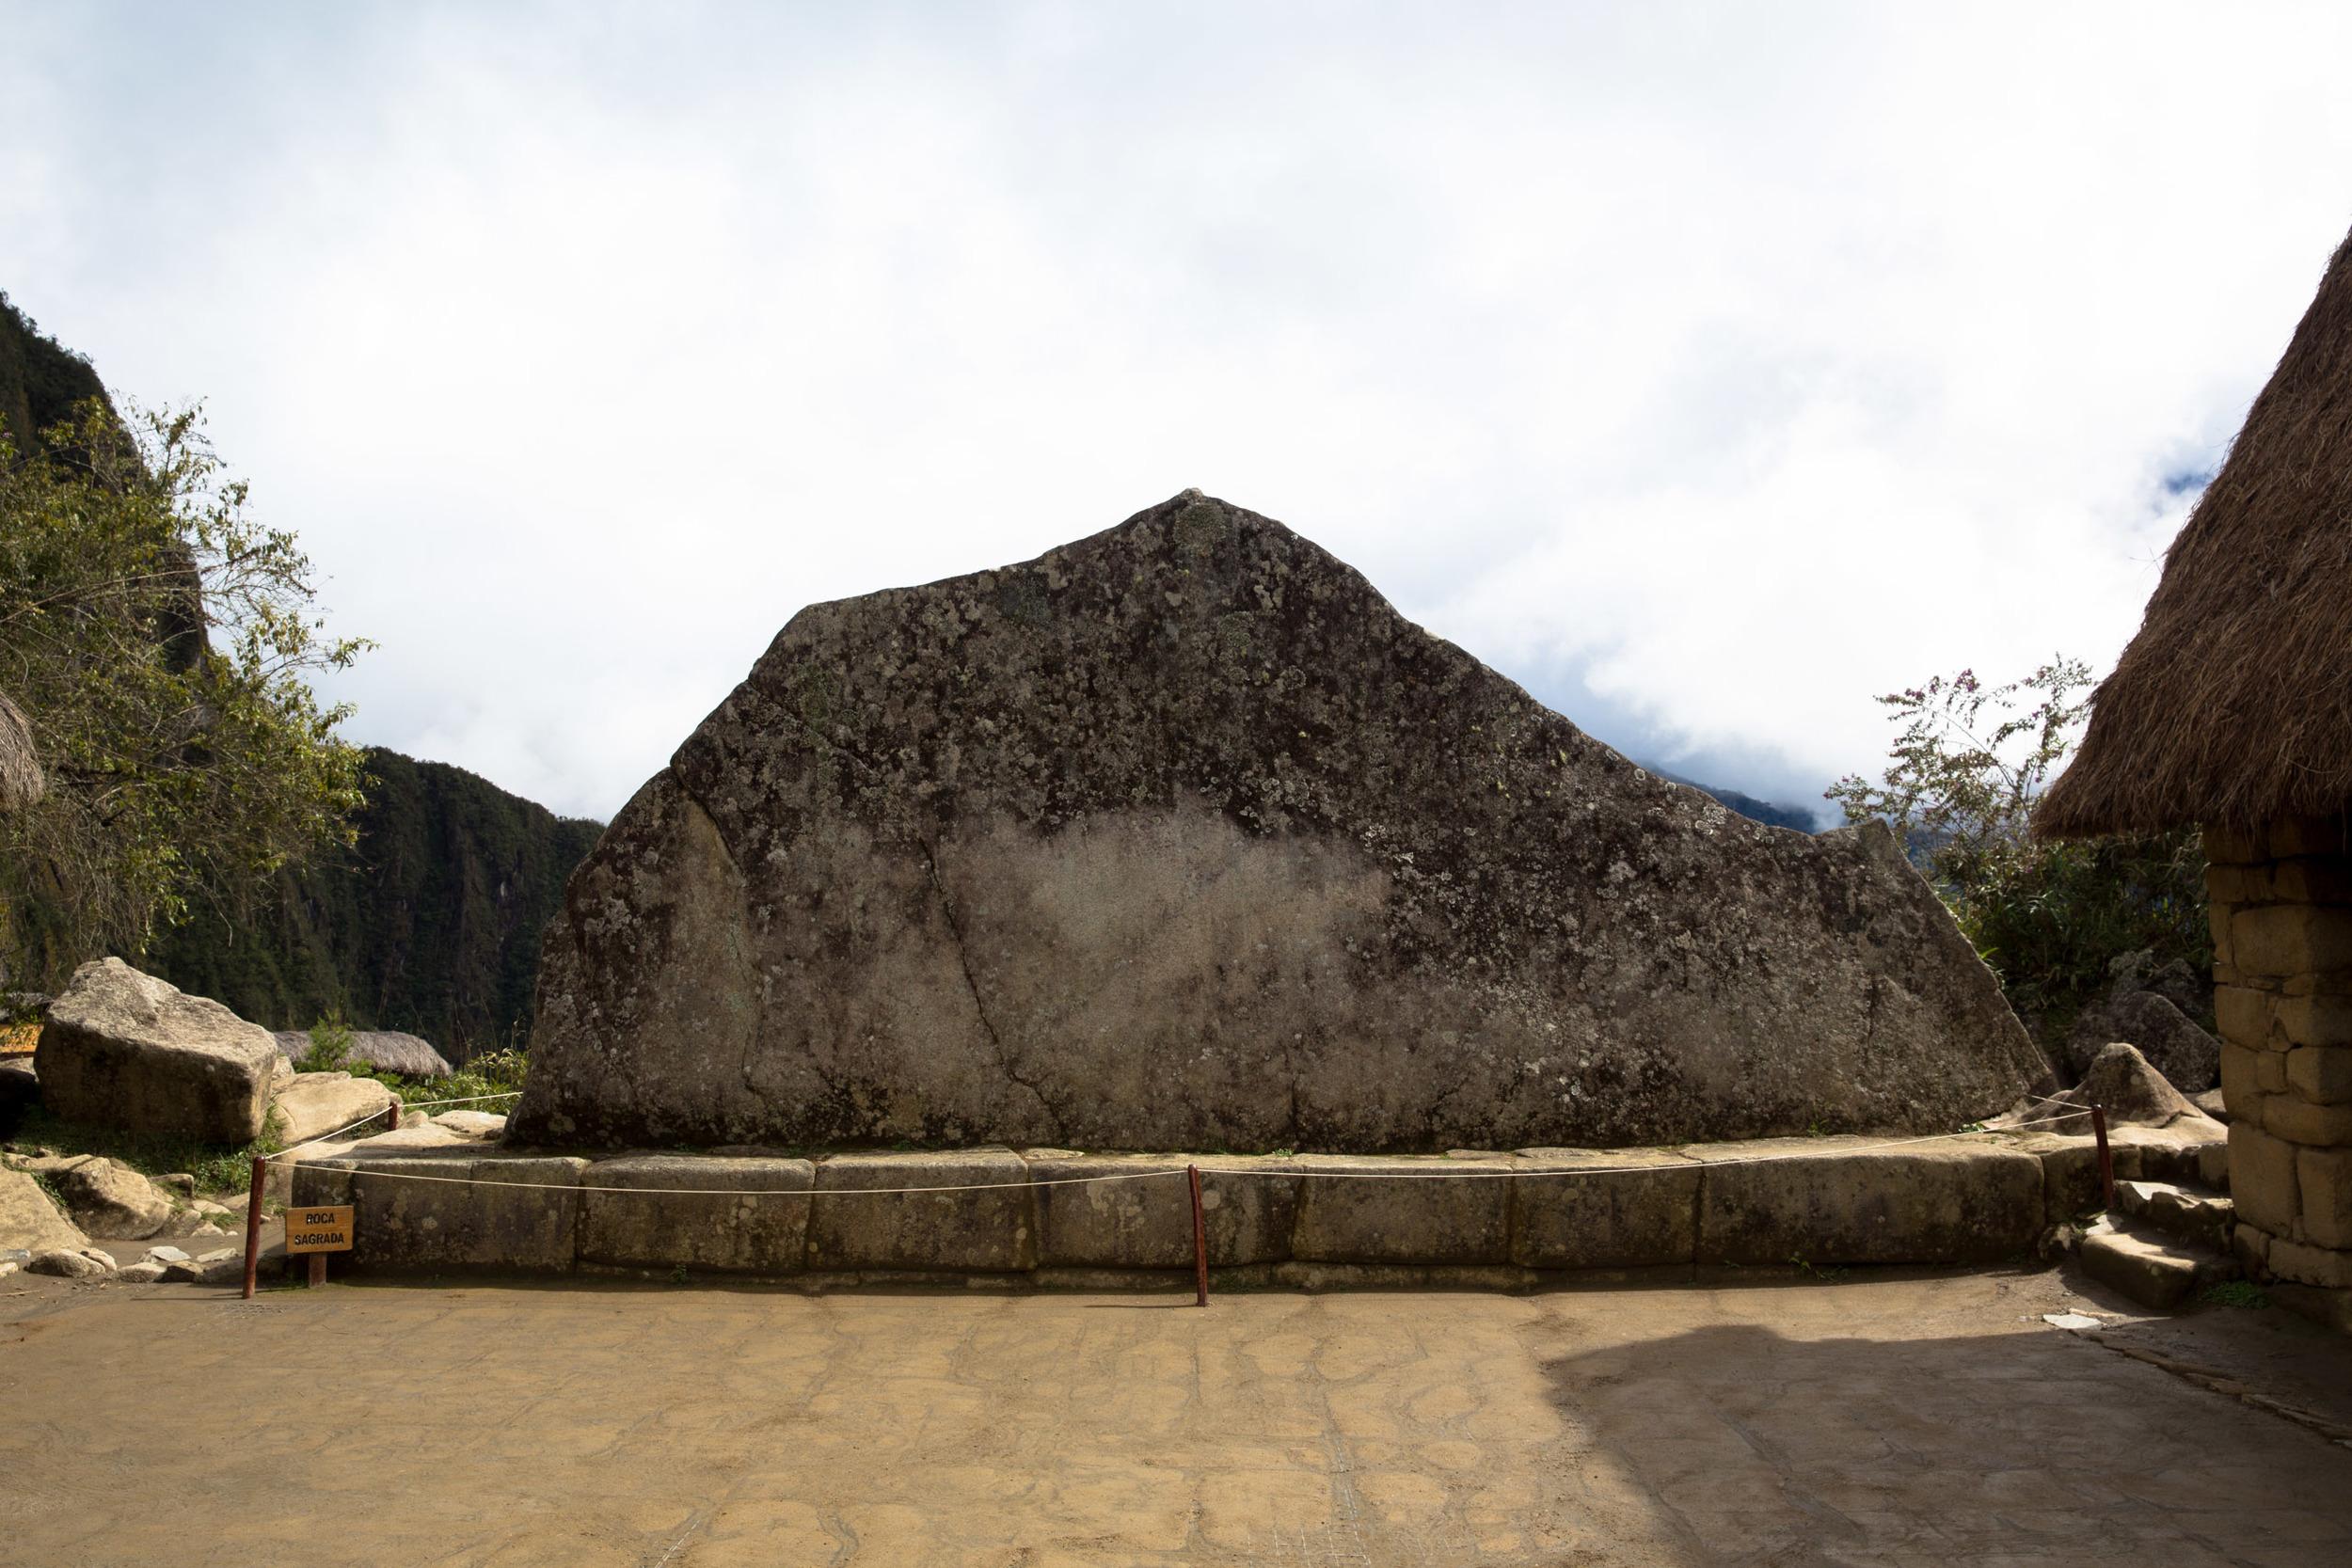 Roca Sagrada, the Sacred Rock